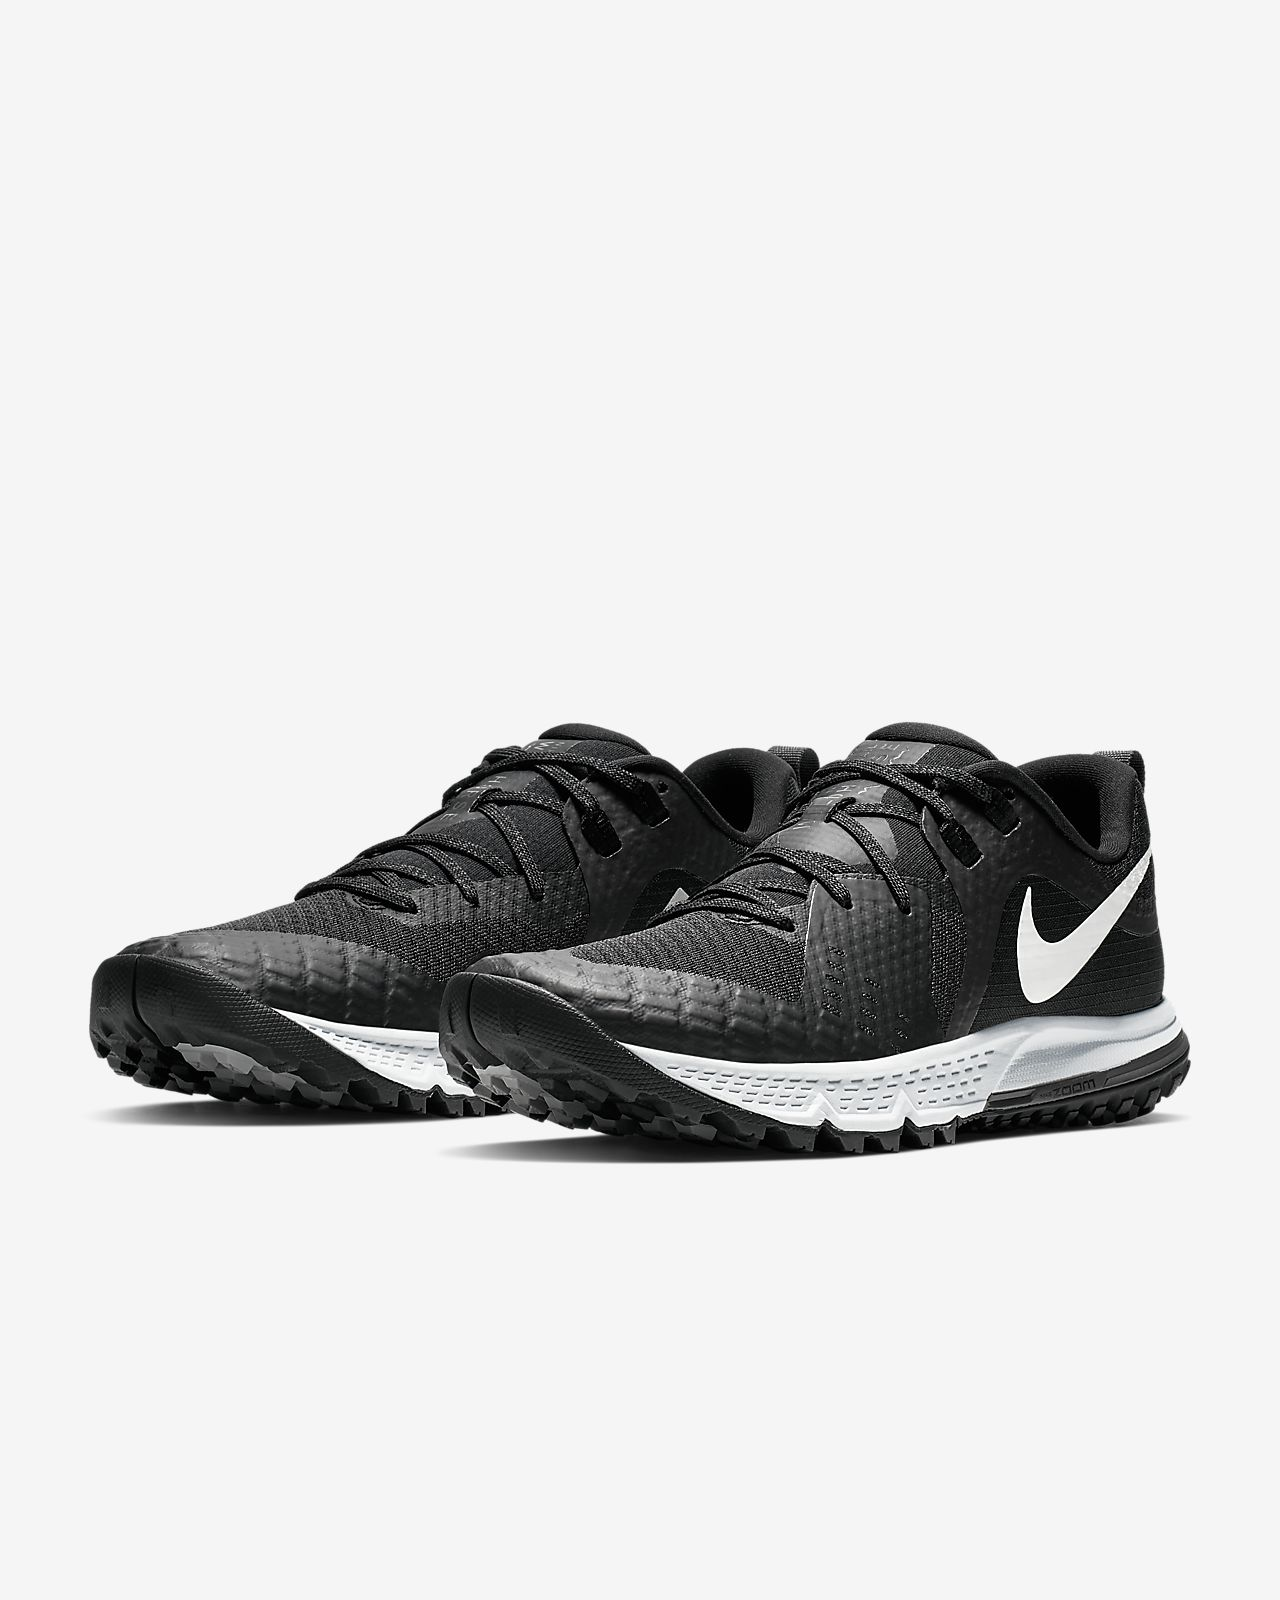 Nike Women's Air Zoom Wildhorse 5 Shoe